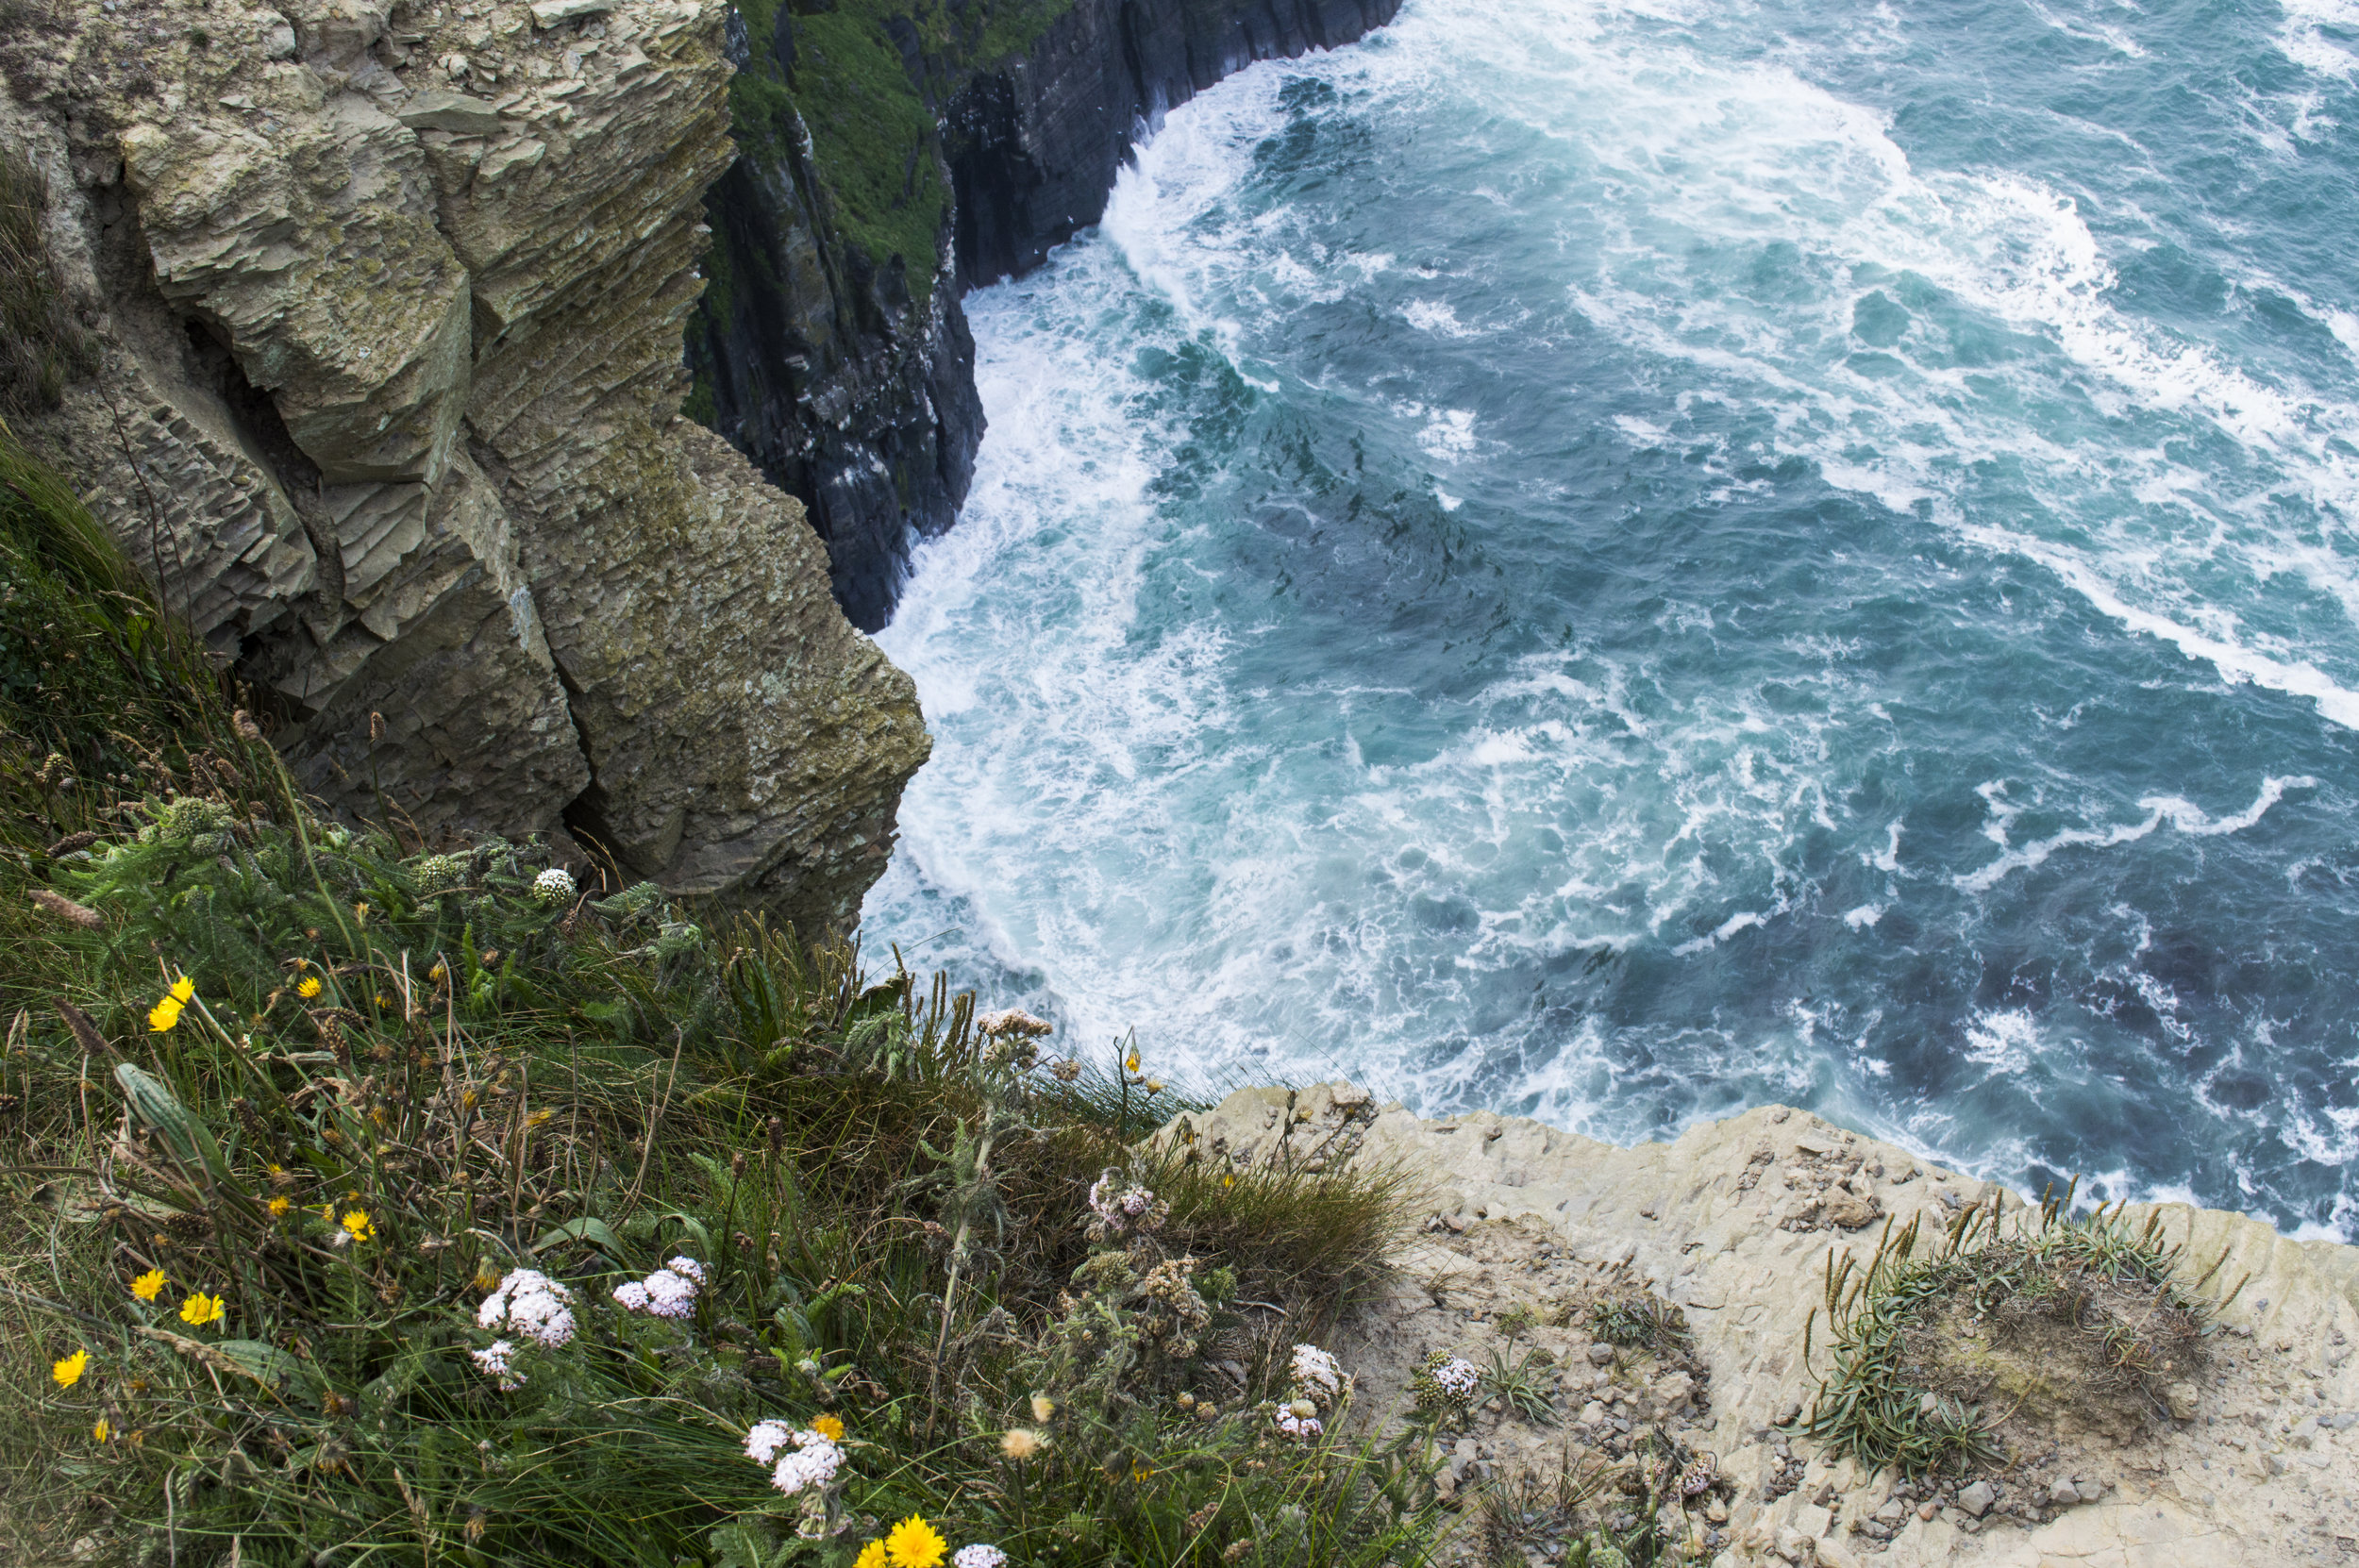 Cliffs_026.jpg